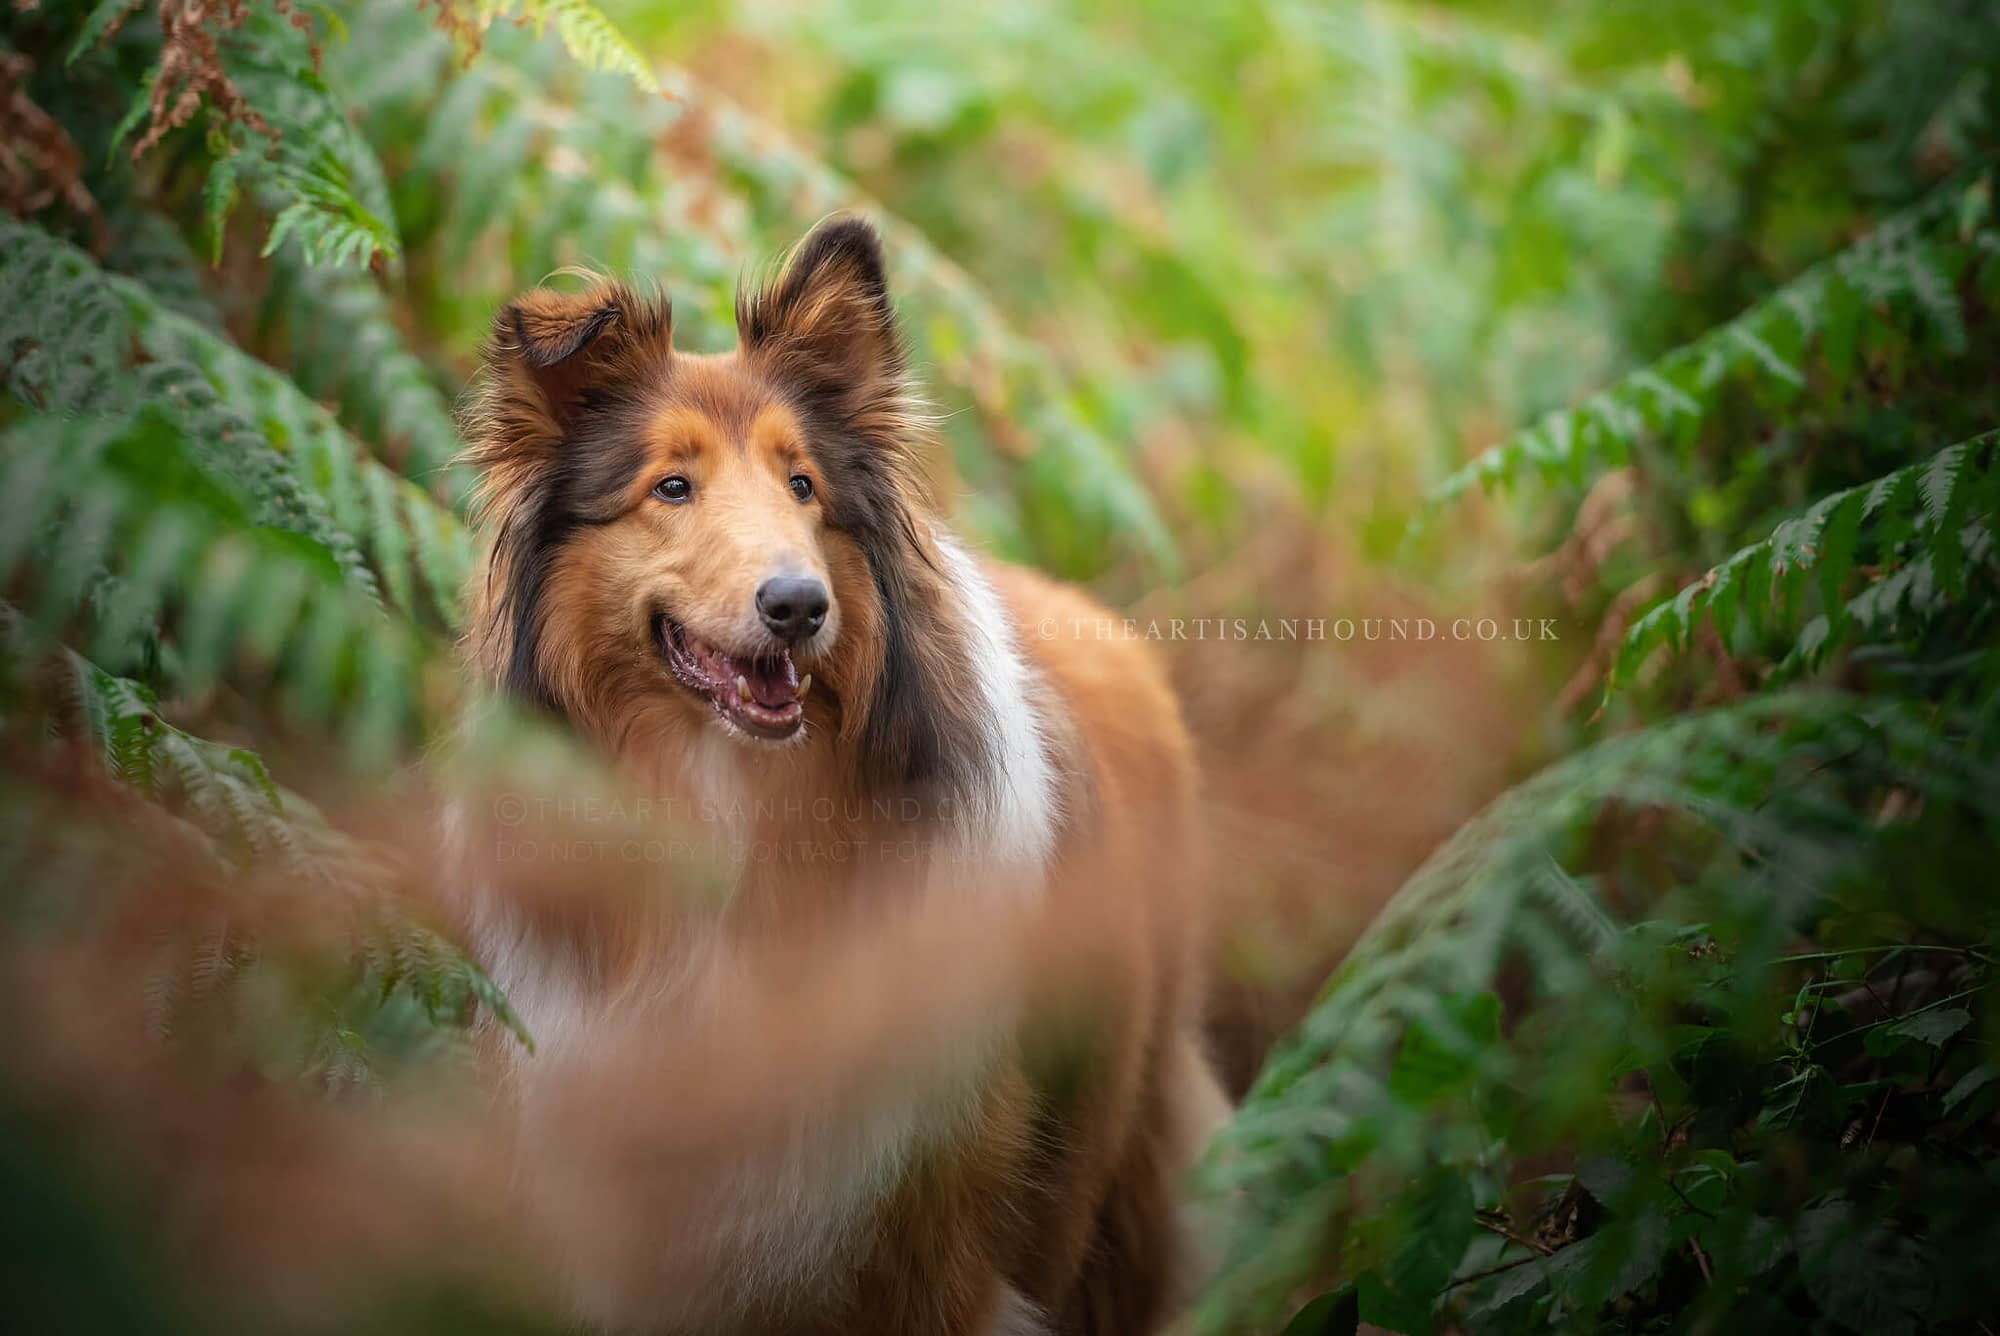 Rough Collie standing in ferns